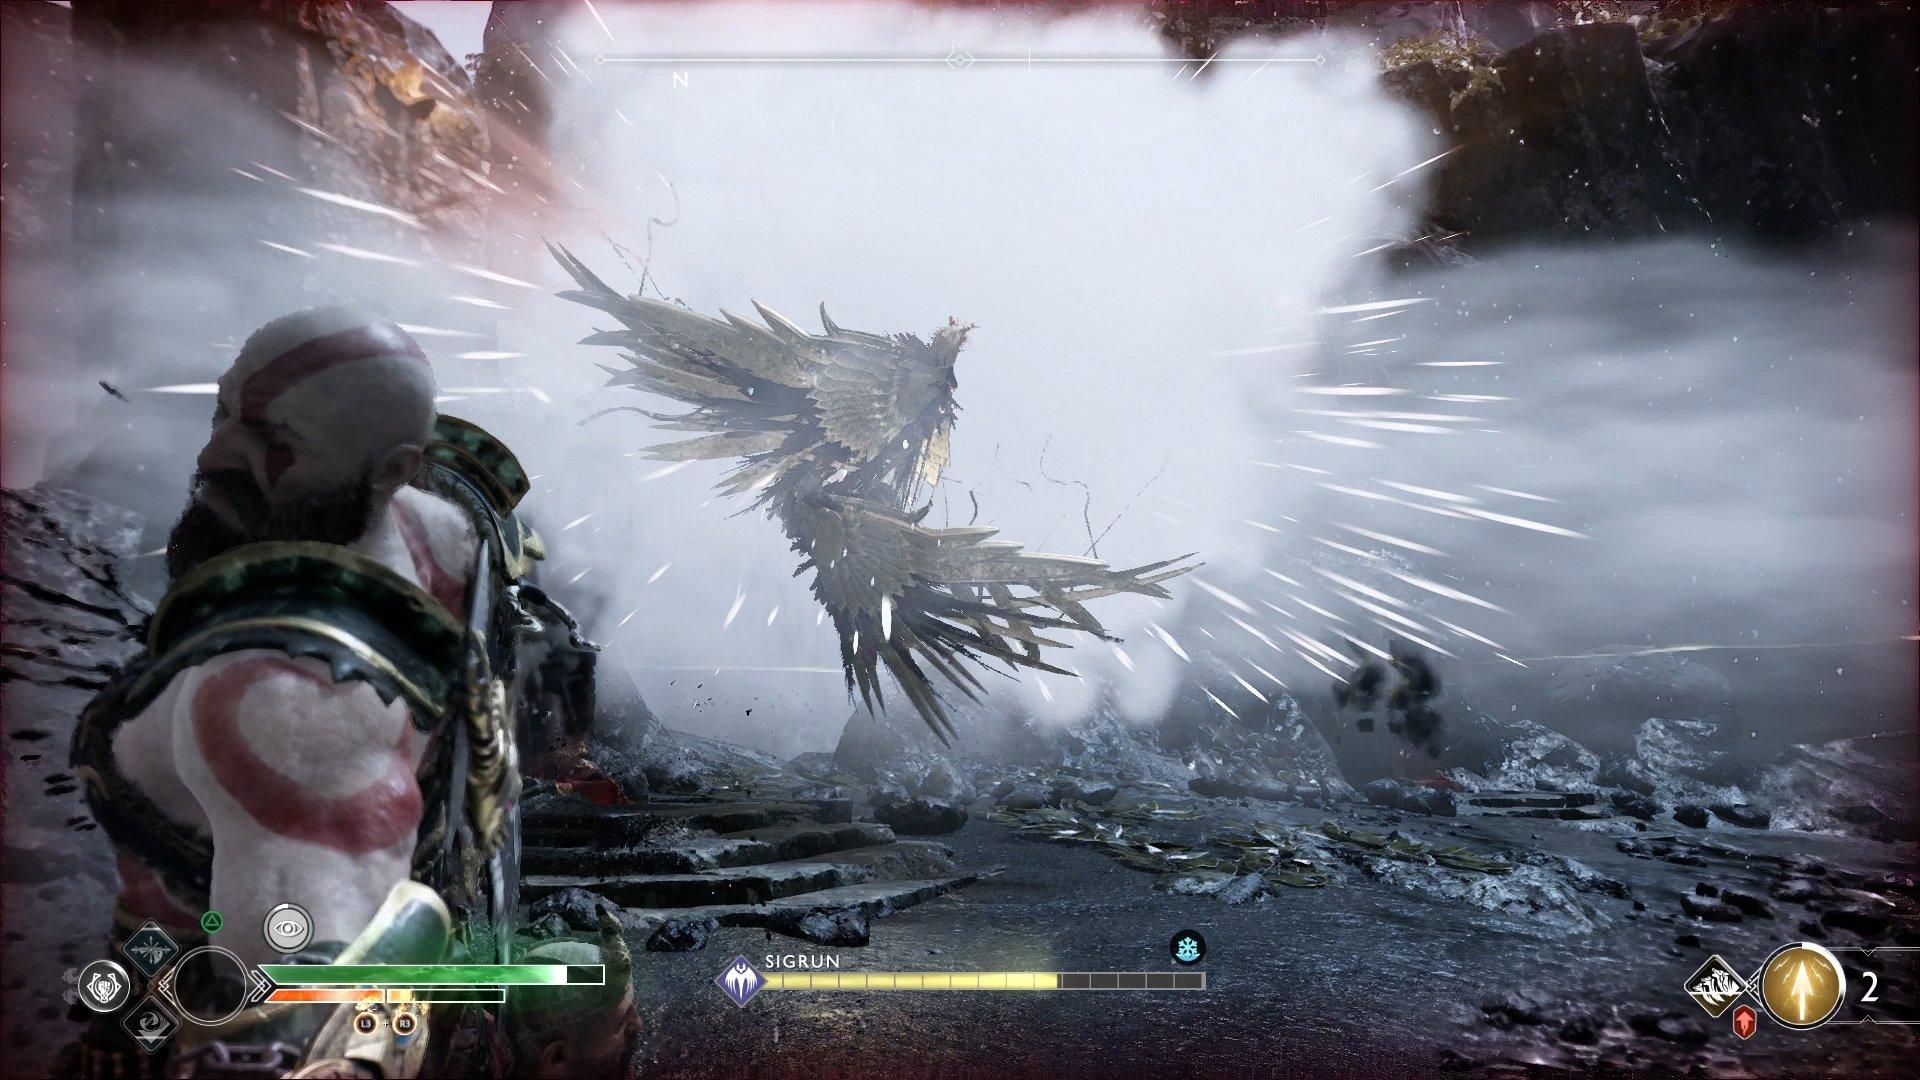 god of war valkyrie queen sigrun fog attack